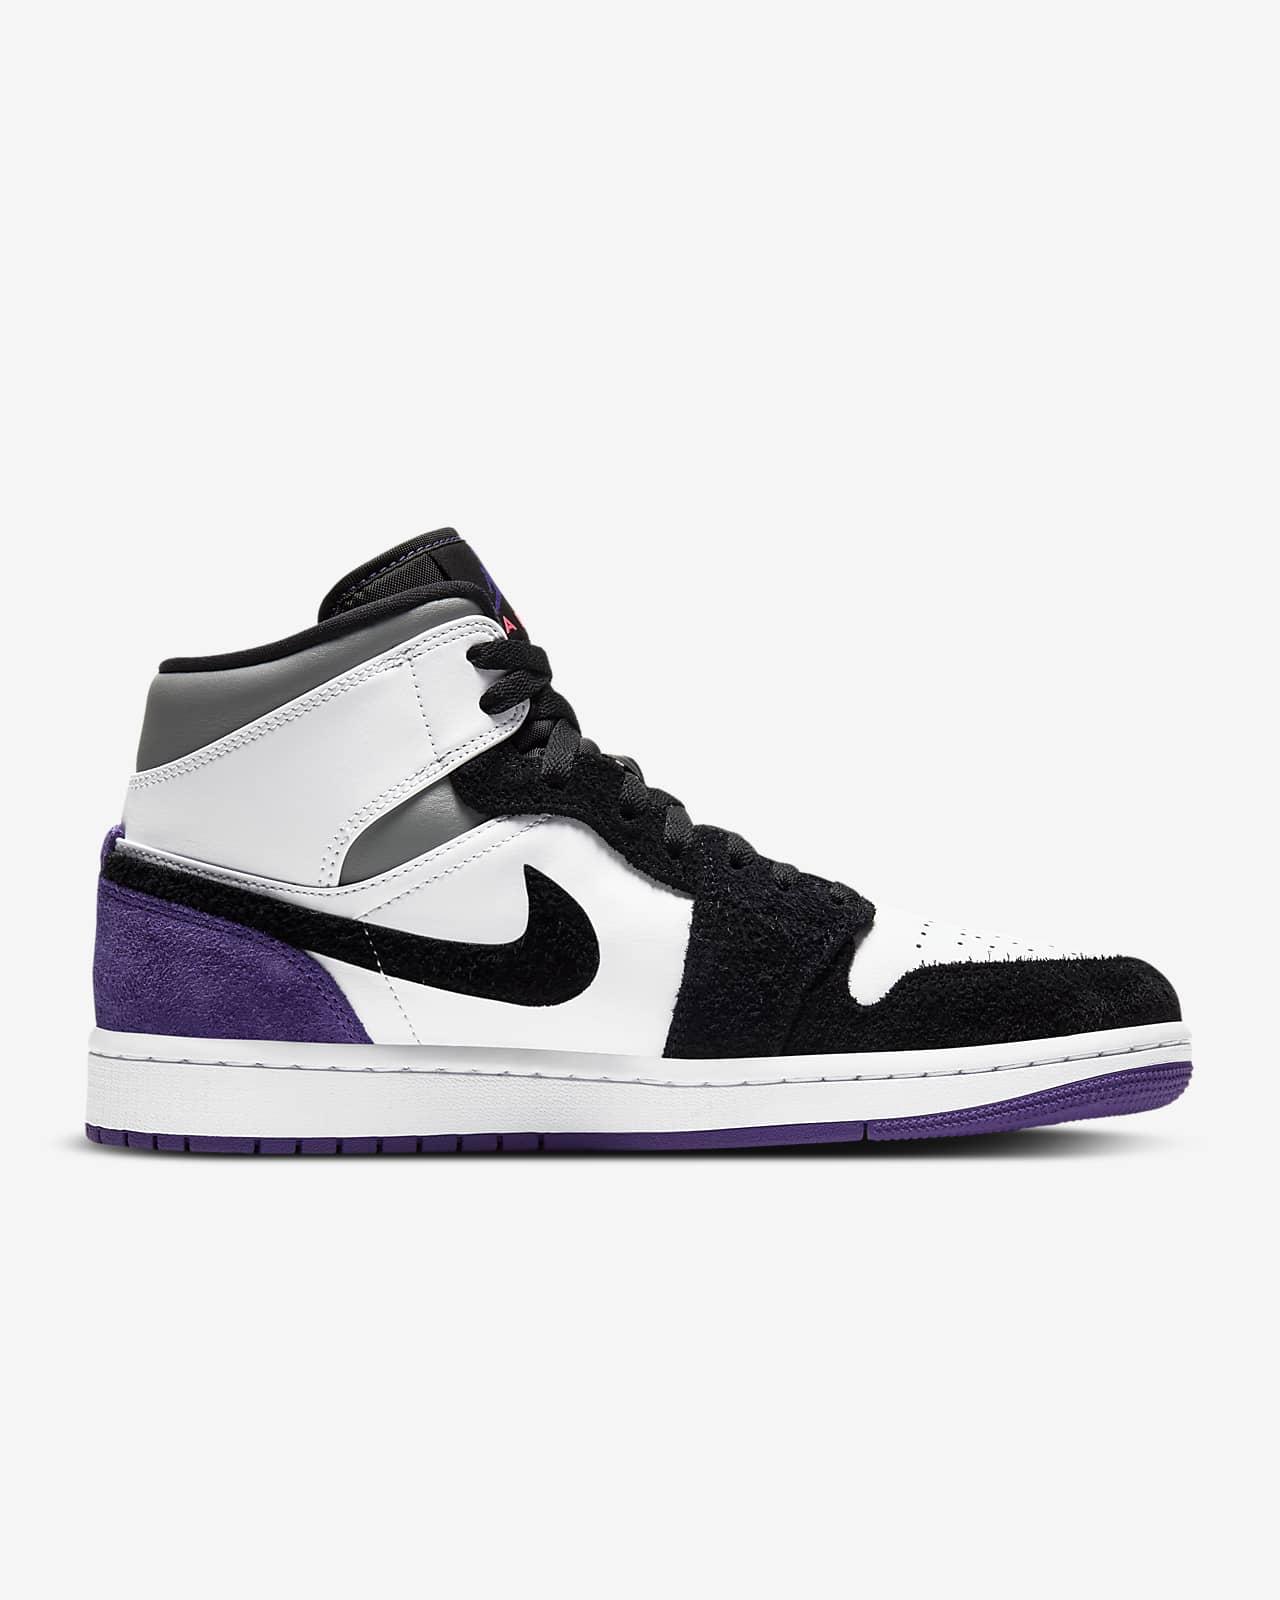 Chaussure Air Jordan 1 Mid SE pour Homme. Nike LU